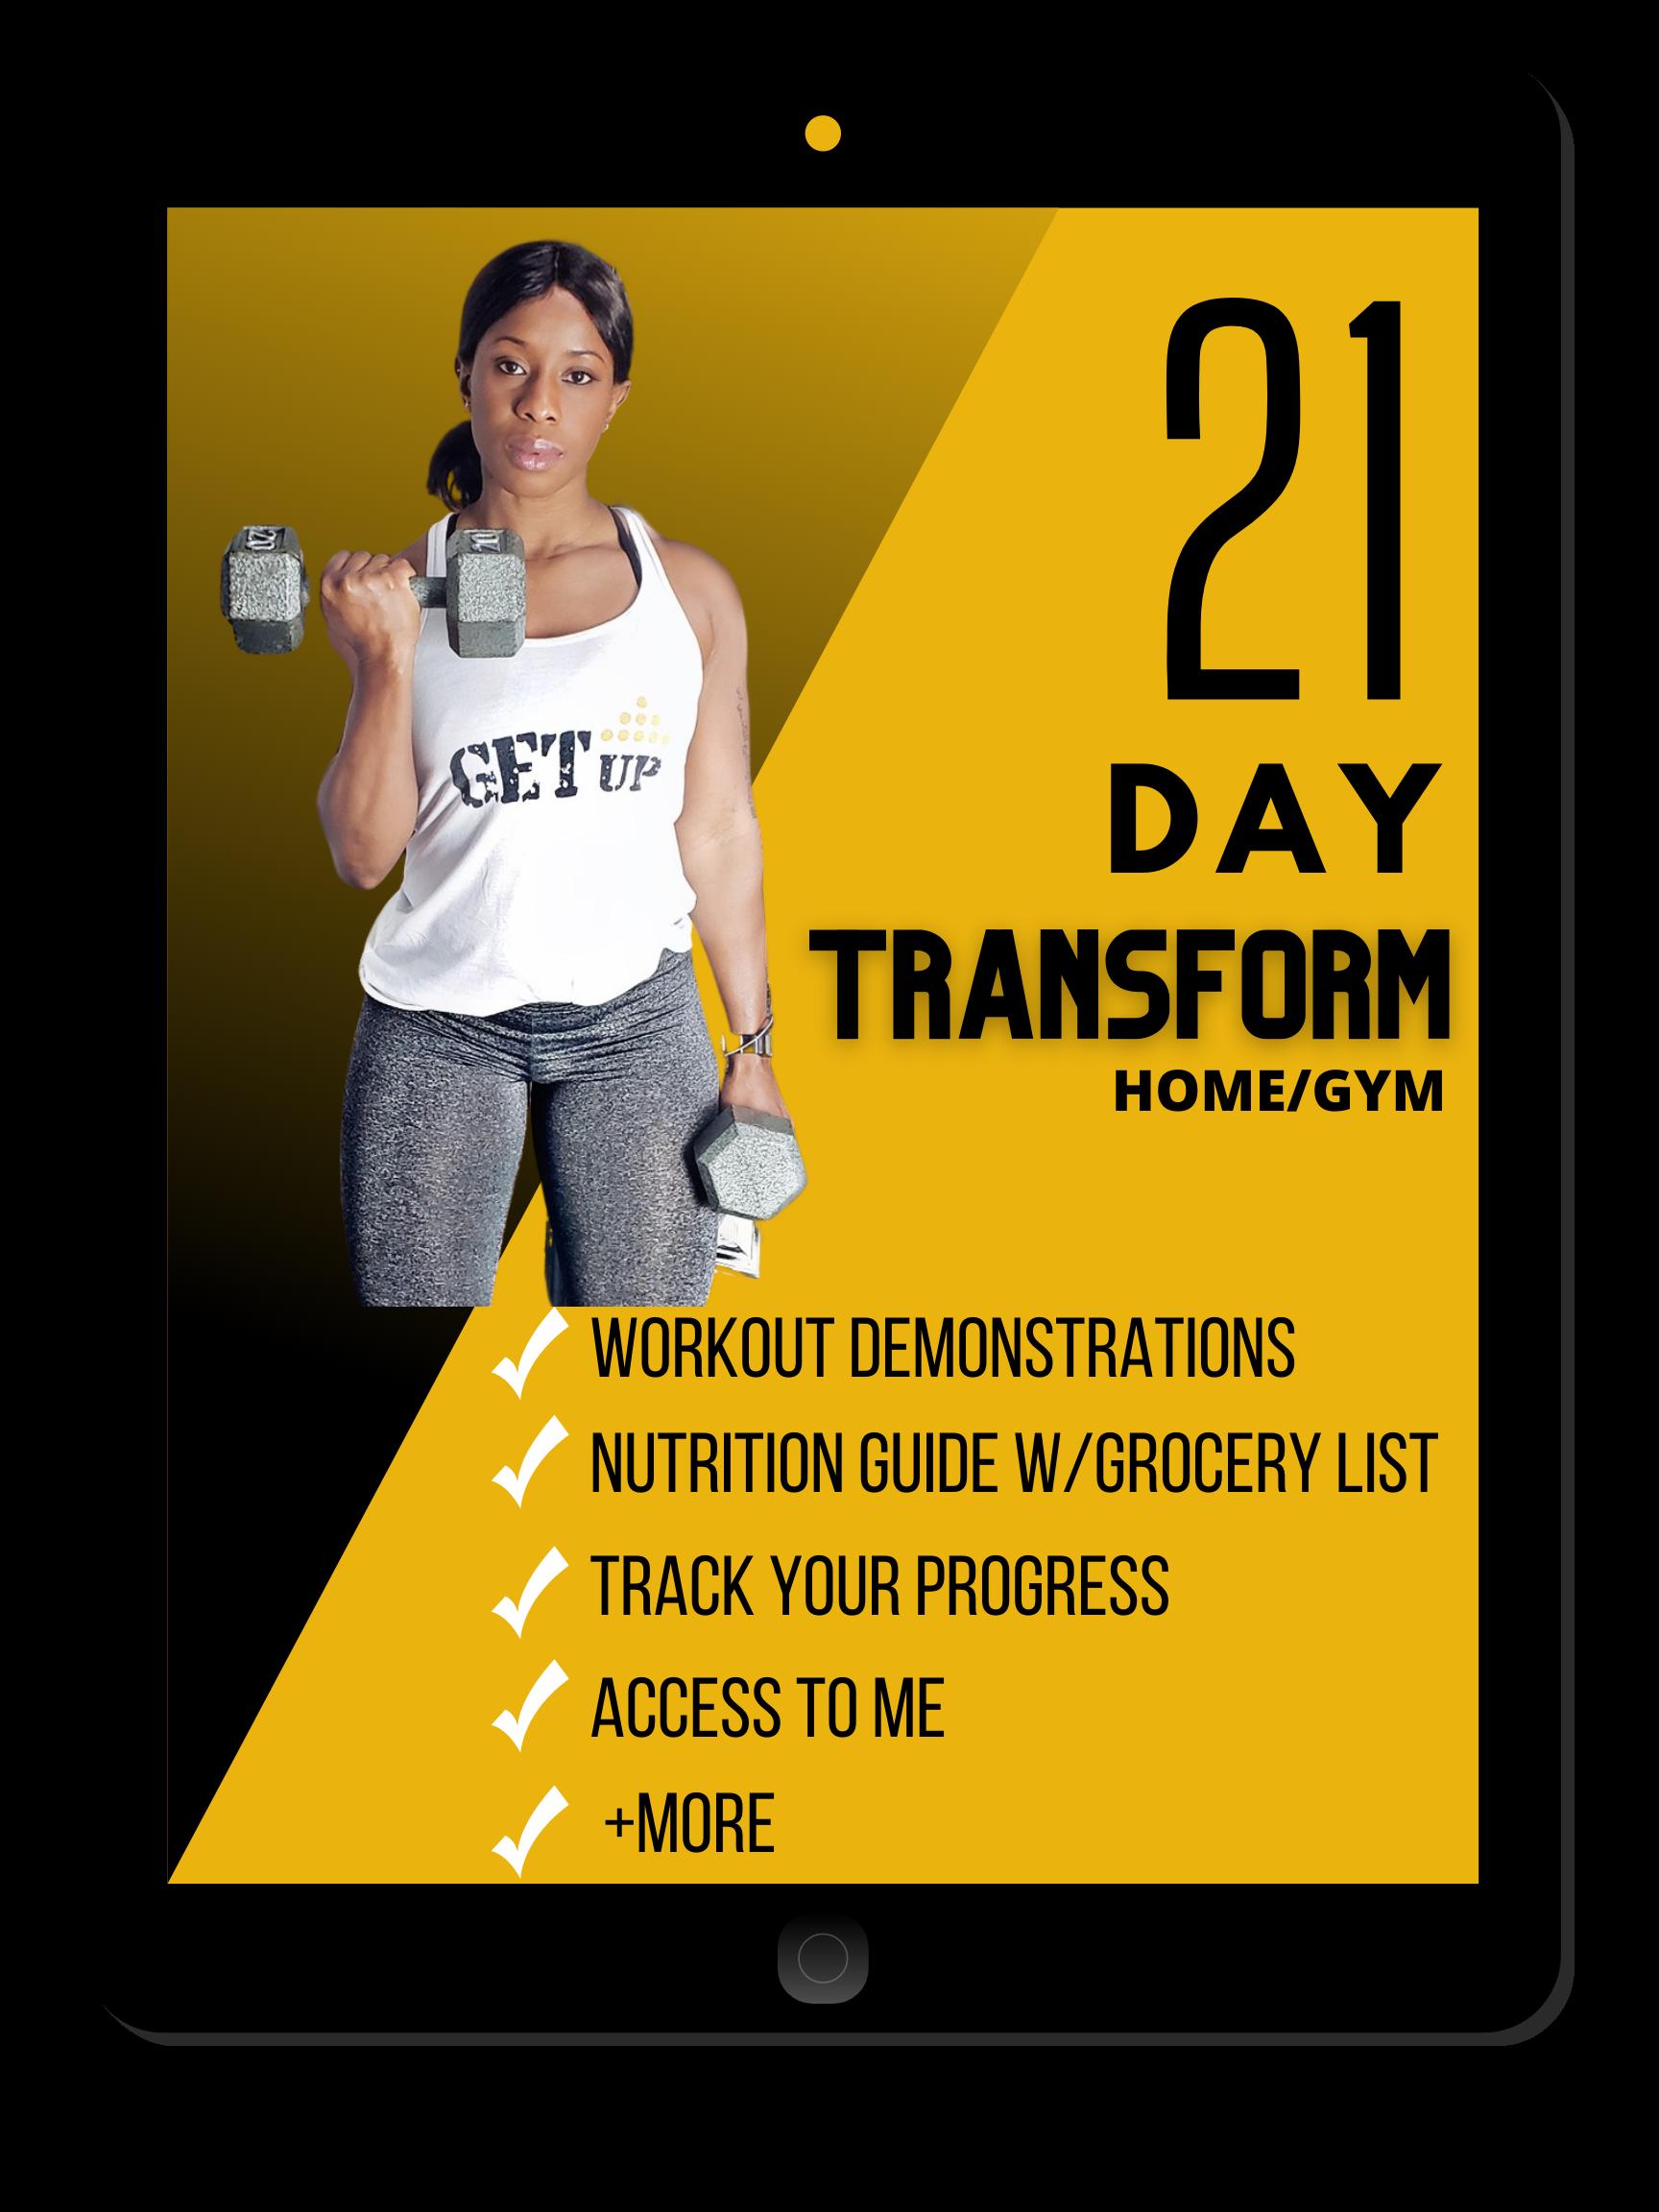 21 Day Transform